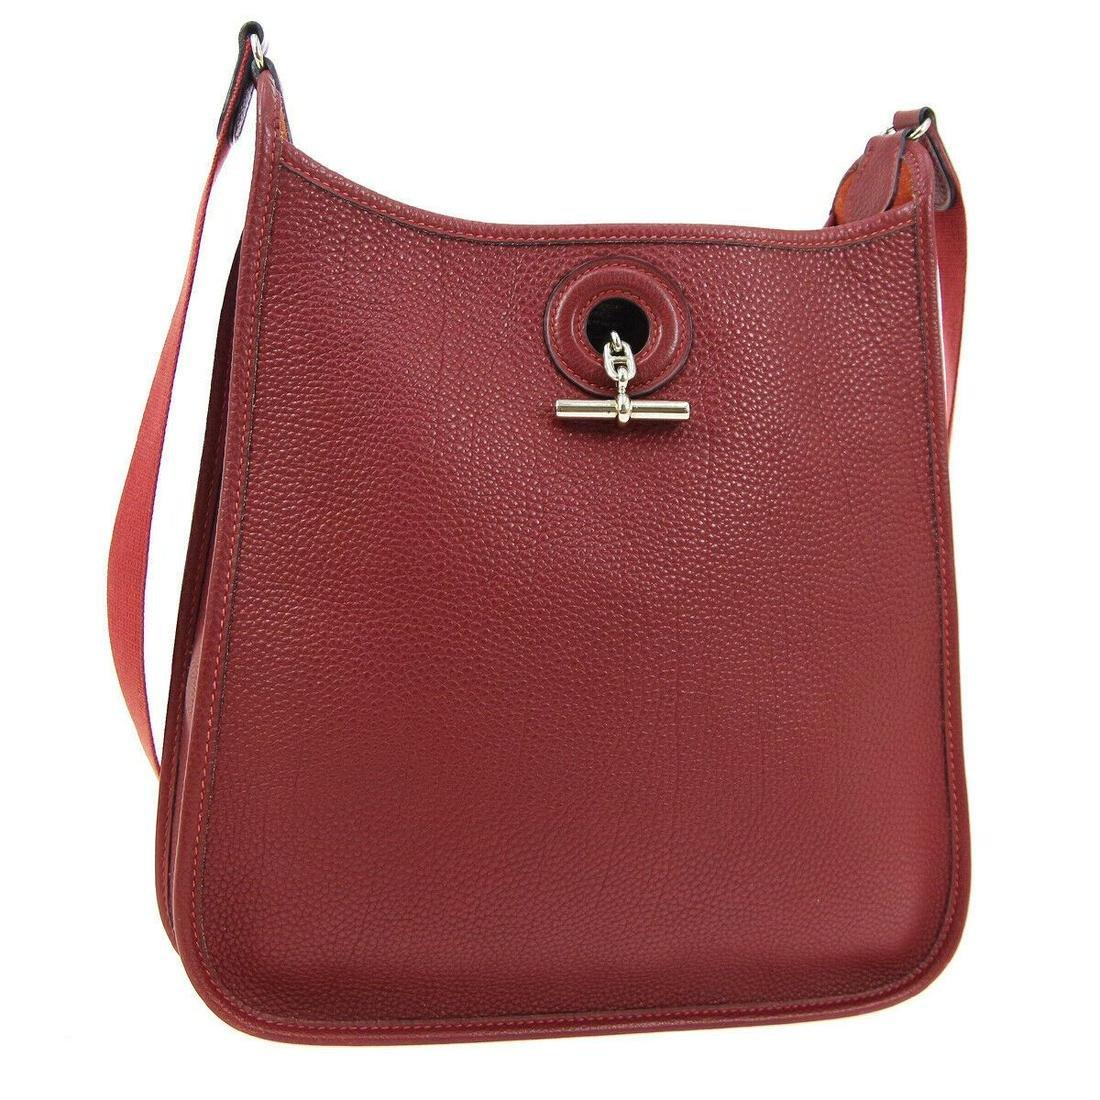 Authentic HERMES VESPA PM Shoulder Bag